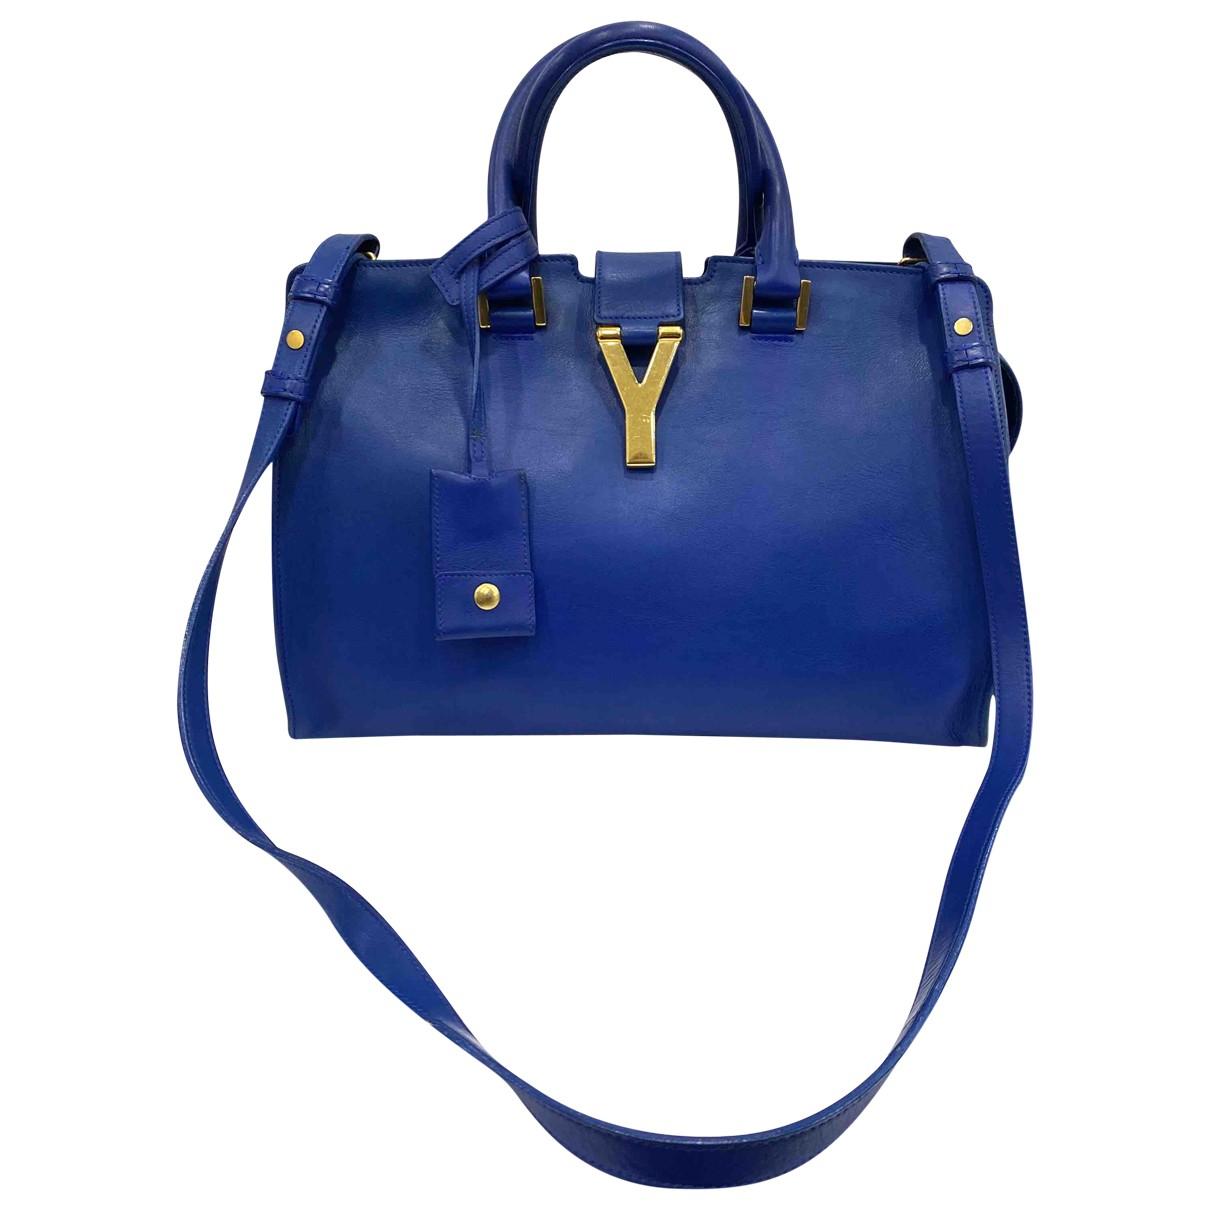 Saint Laurent Chyc Blue Leather handbag for Women \N